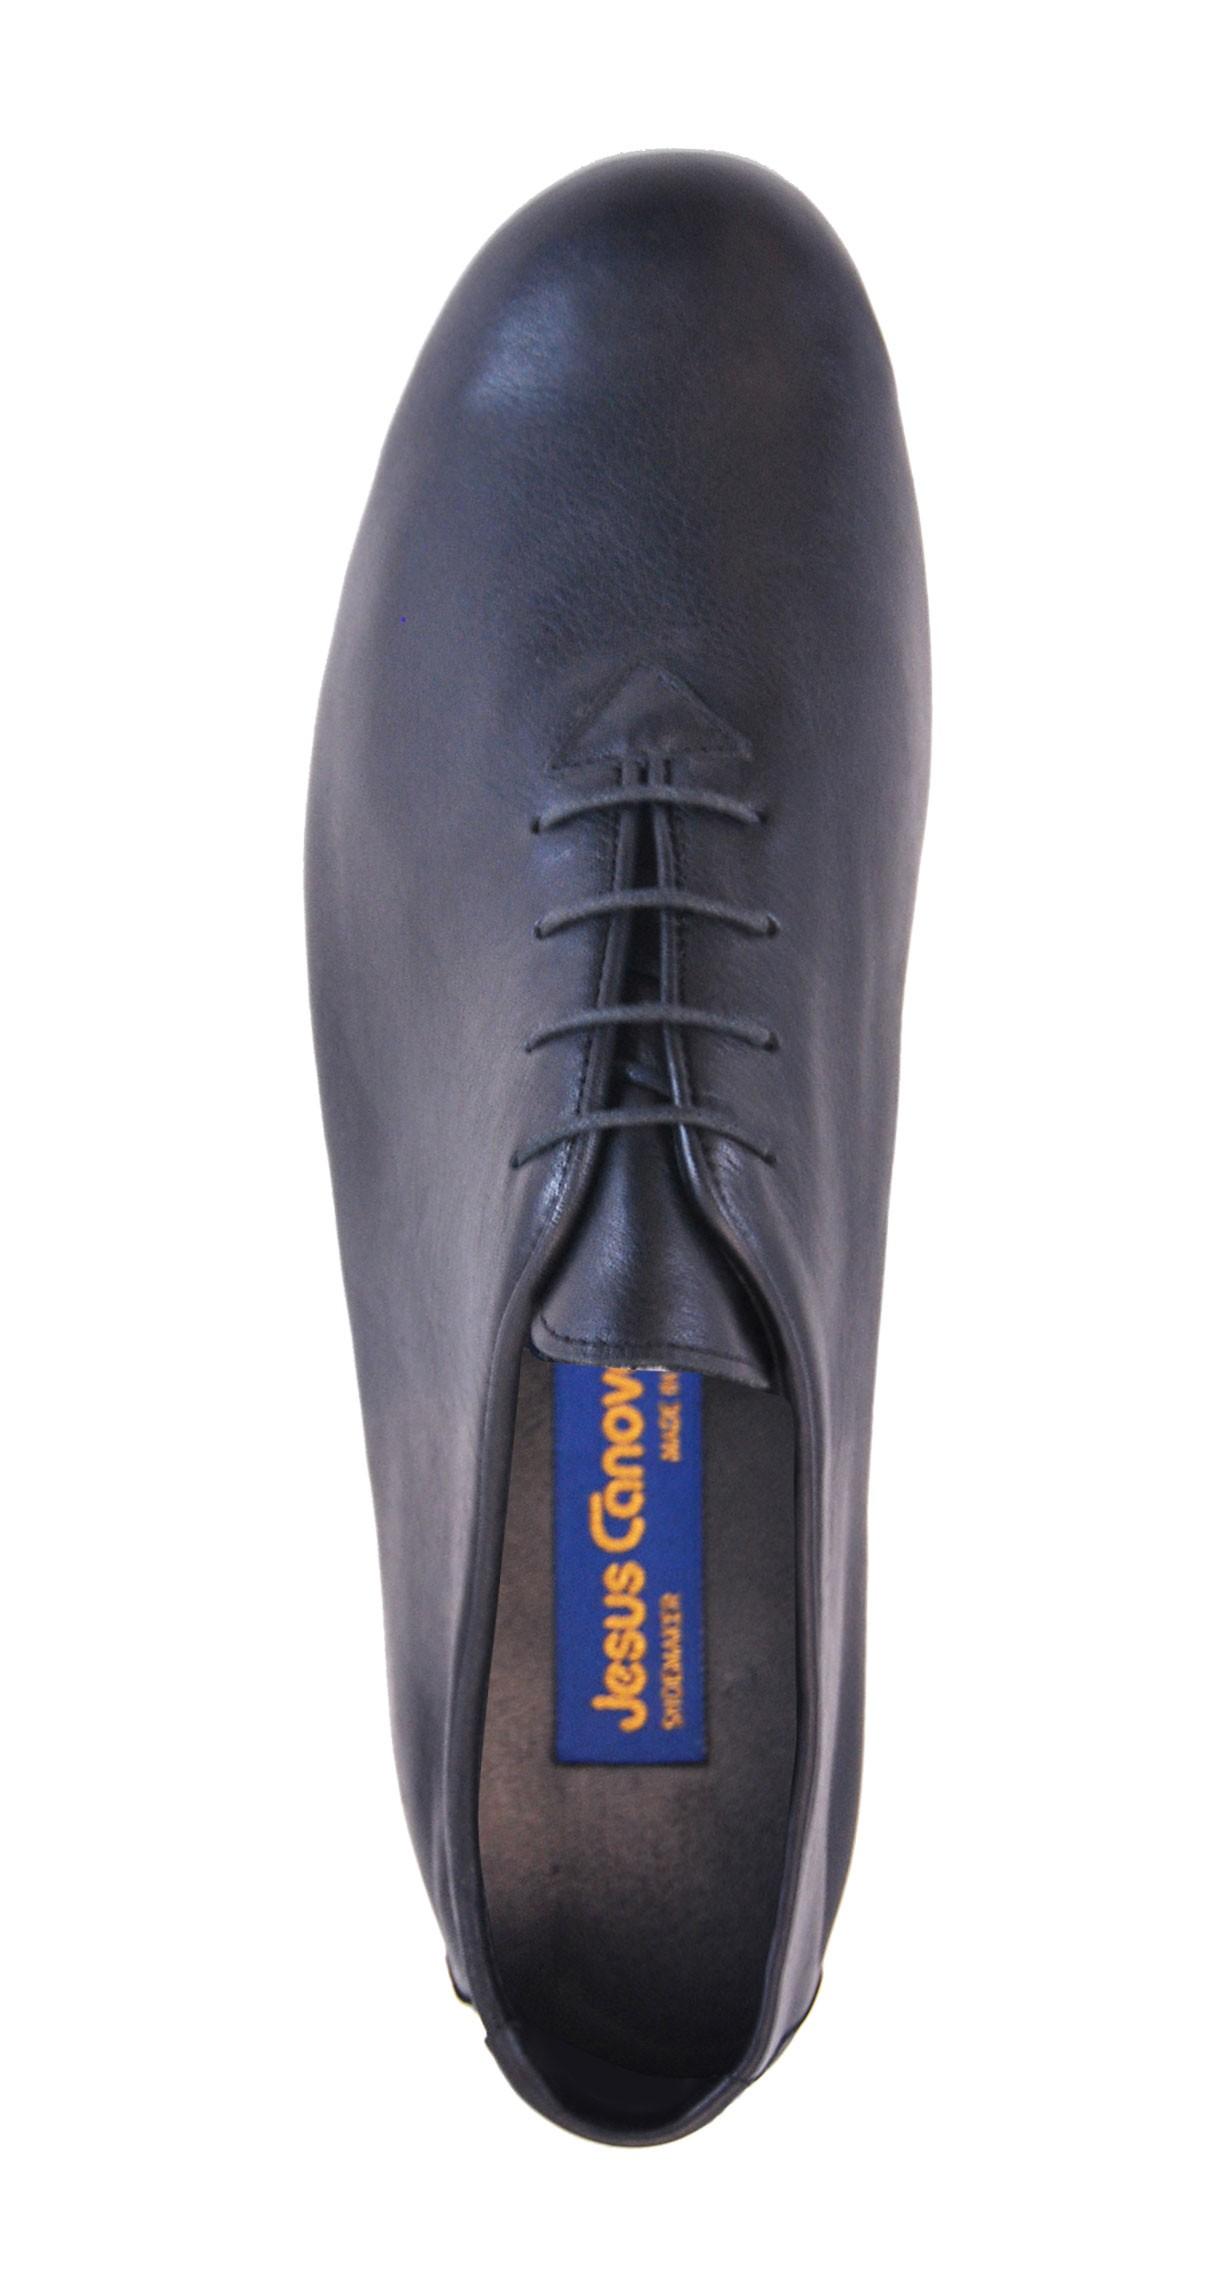 Foto 2 de Zapatos Julio Iglesias Cordon 529 JC Negro Napa